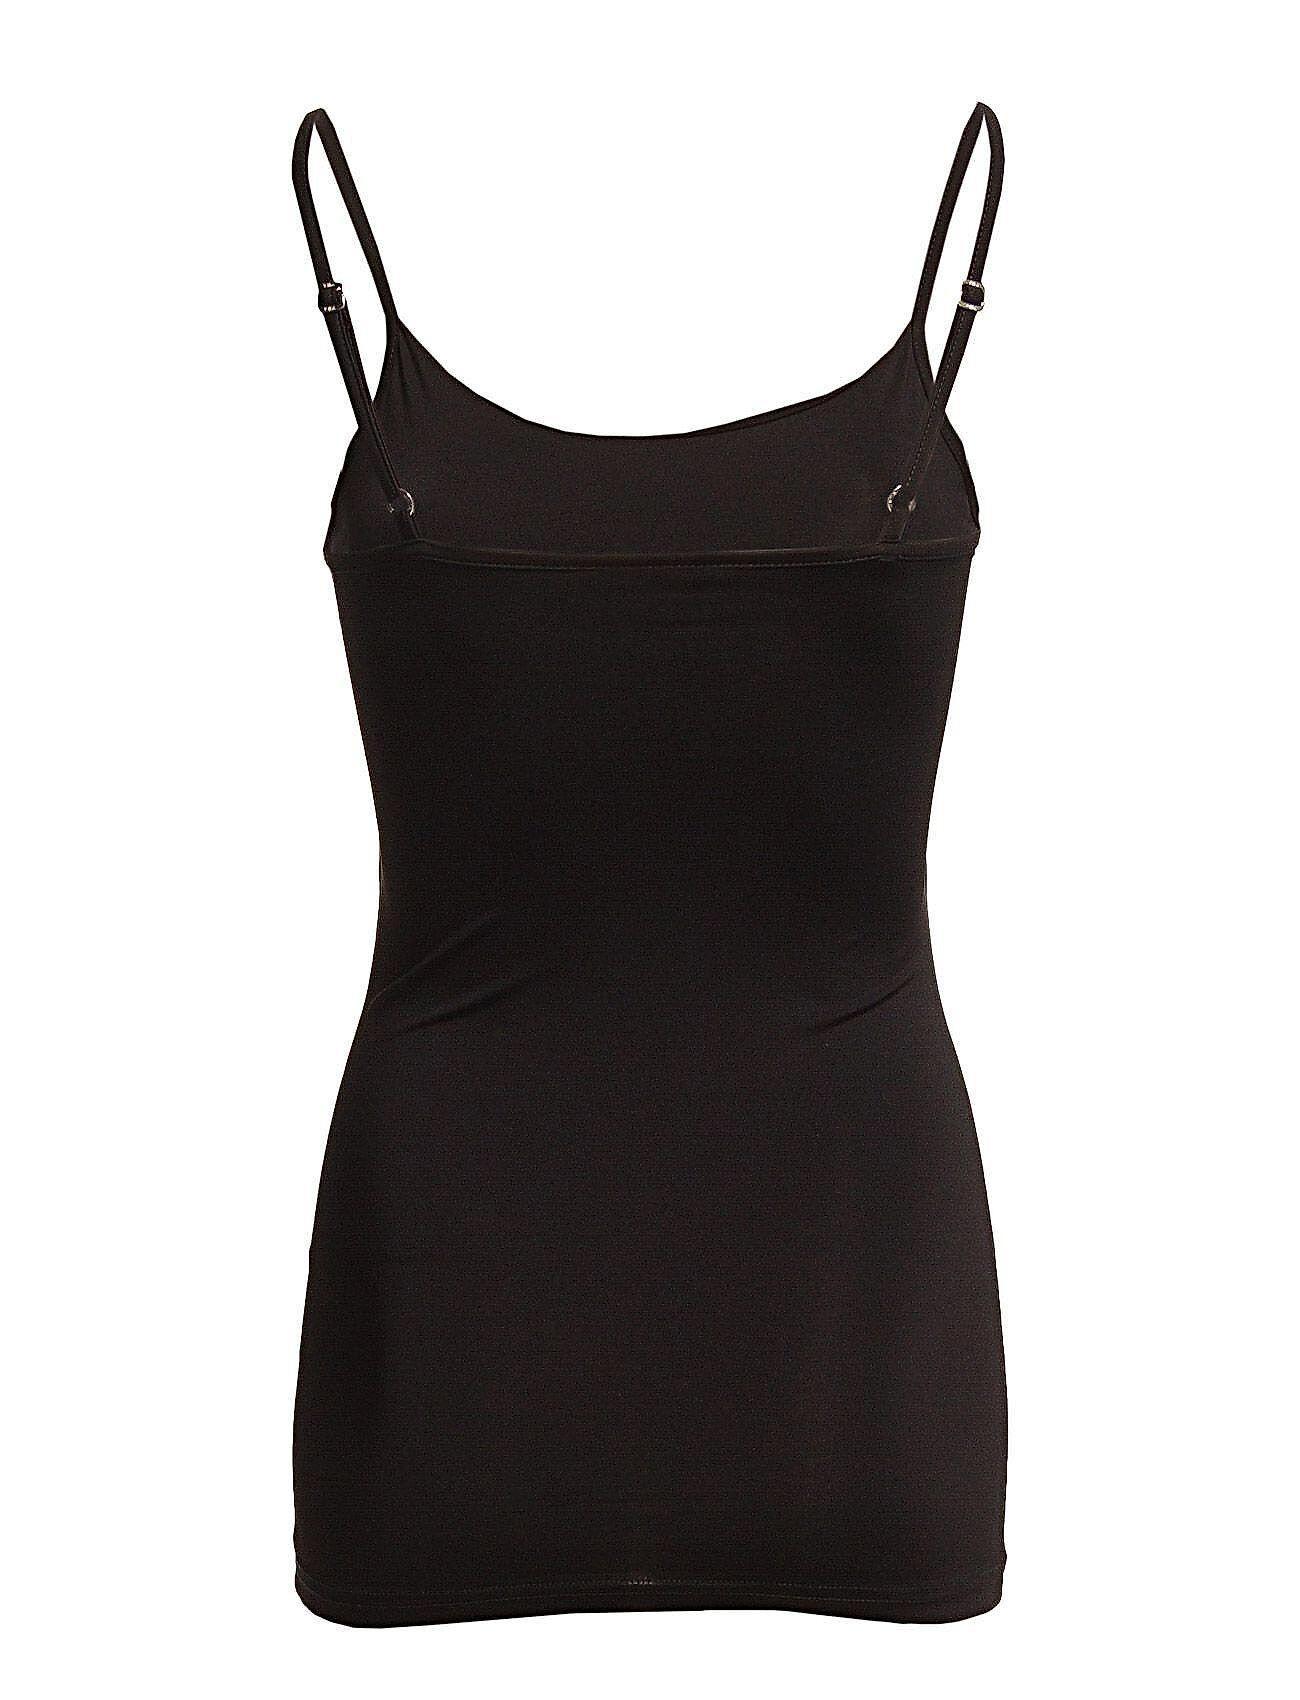 Vila Visurface Strap Top New - Noos T-shirts & Tops Sleeveless Musta Vila